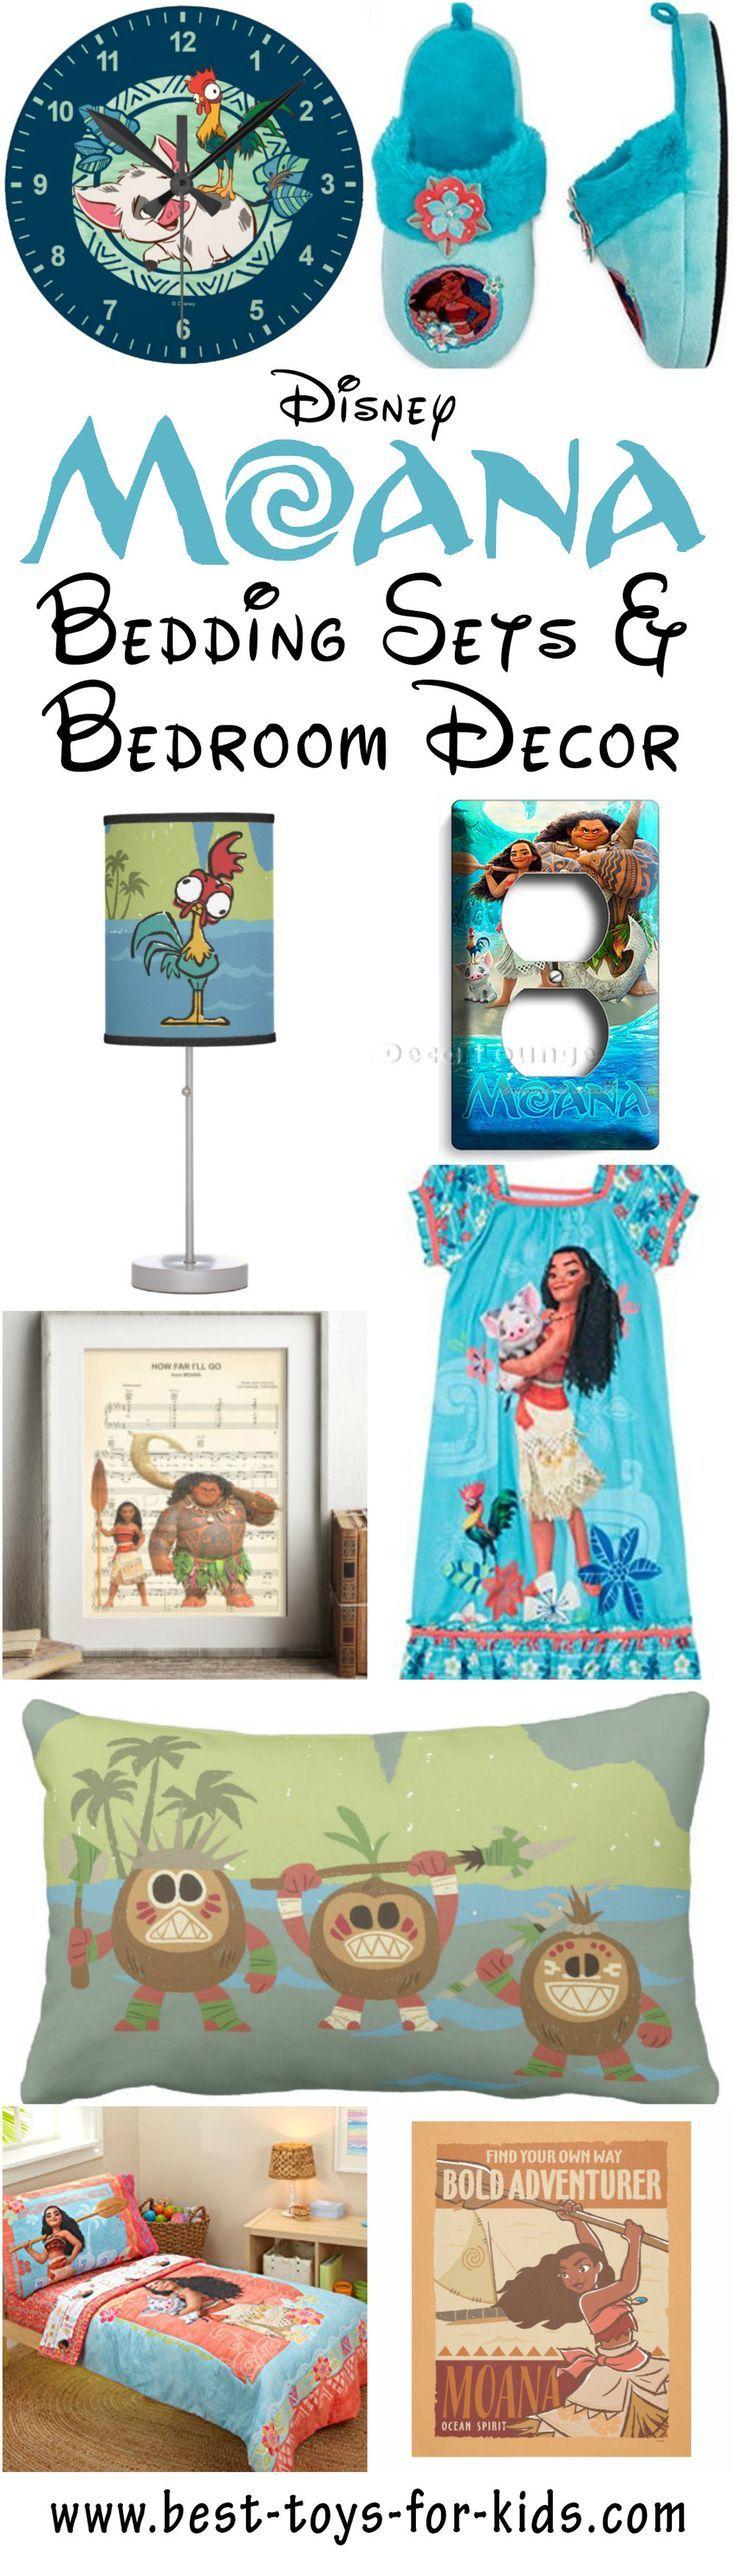 Beautiful Disney Moana Bedroom Decor for Sweet Princess Dreams ...